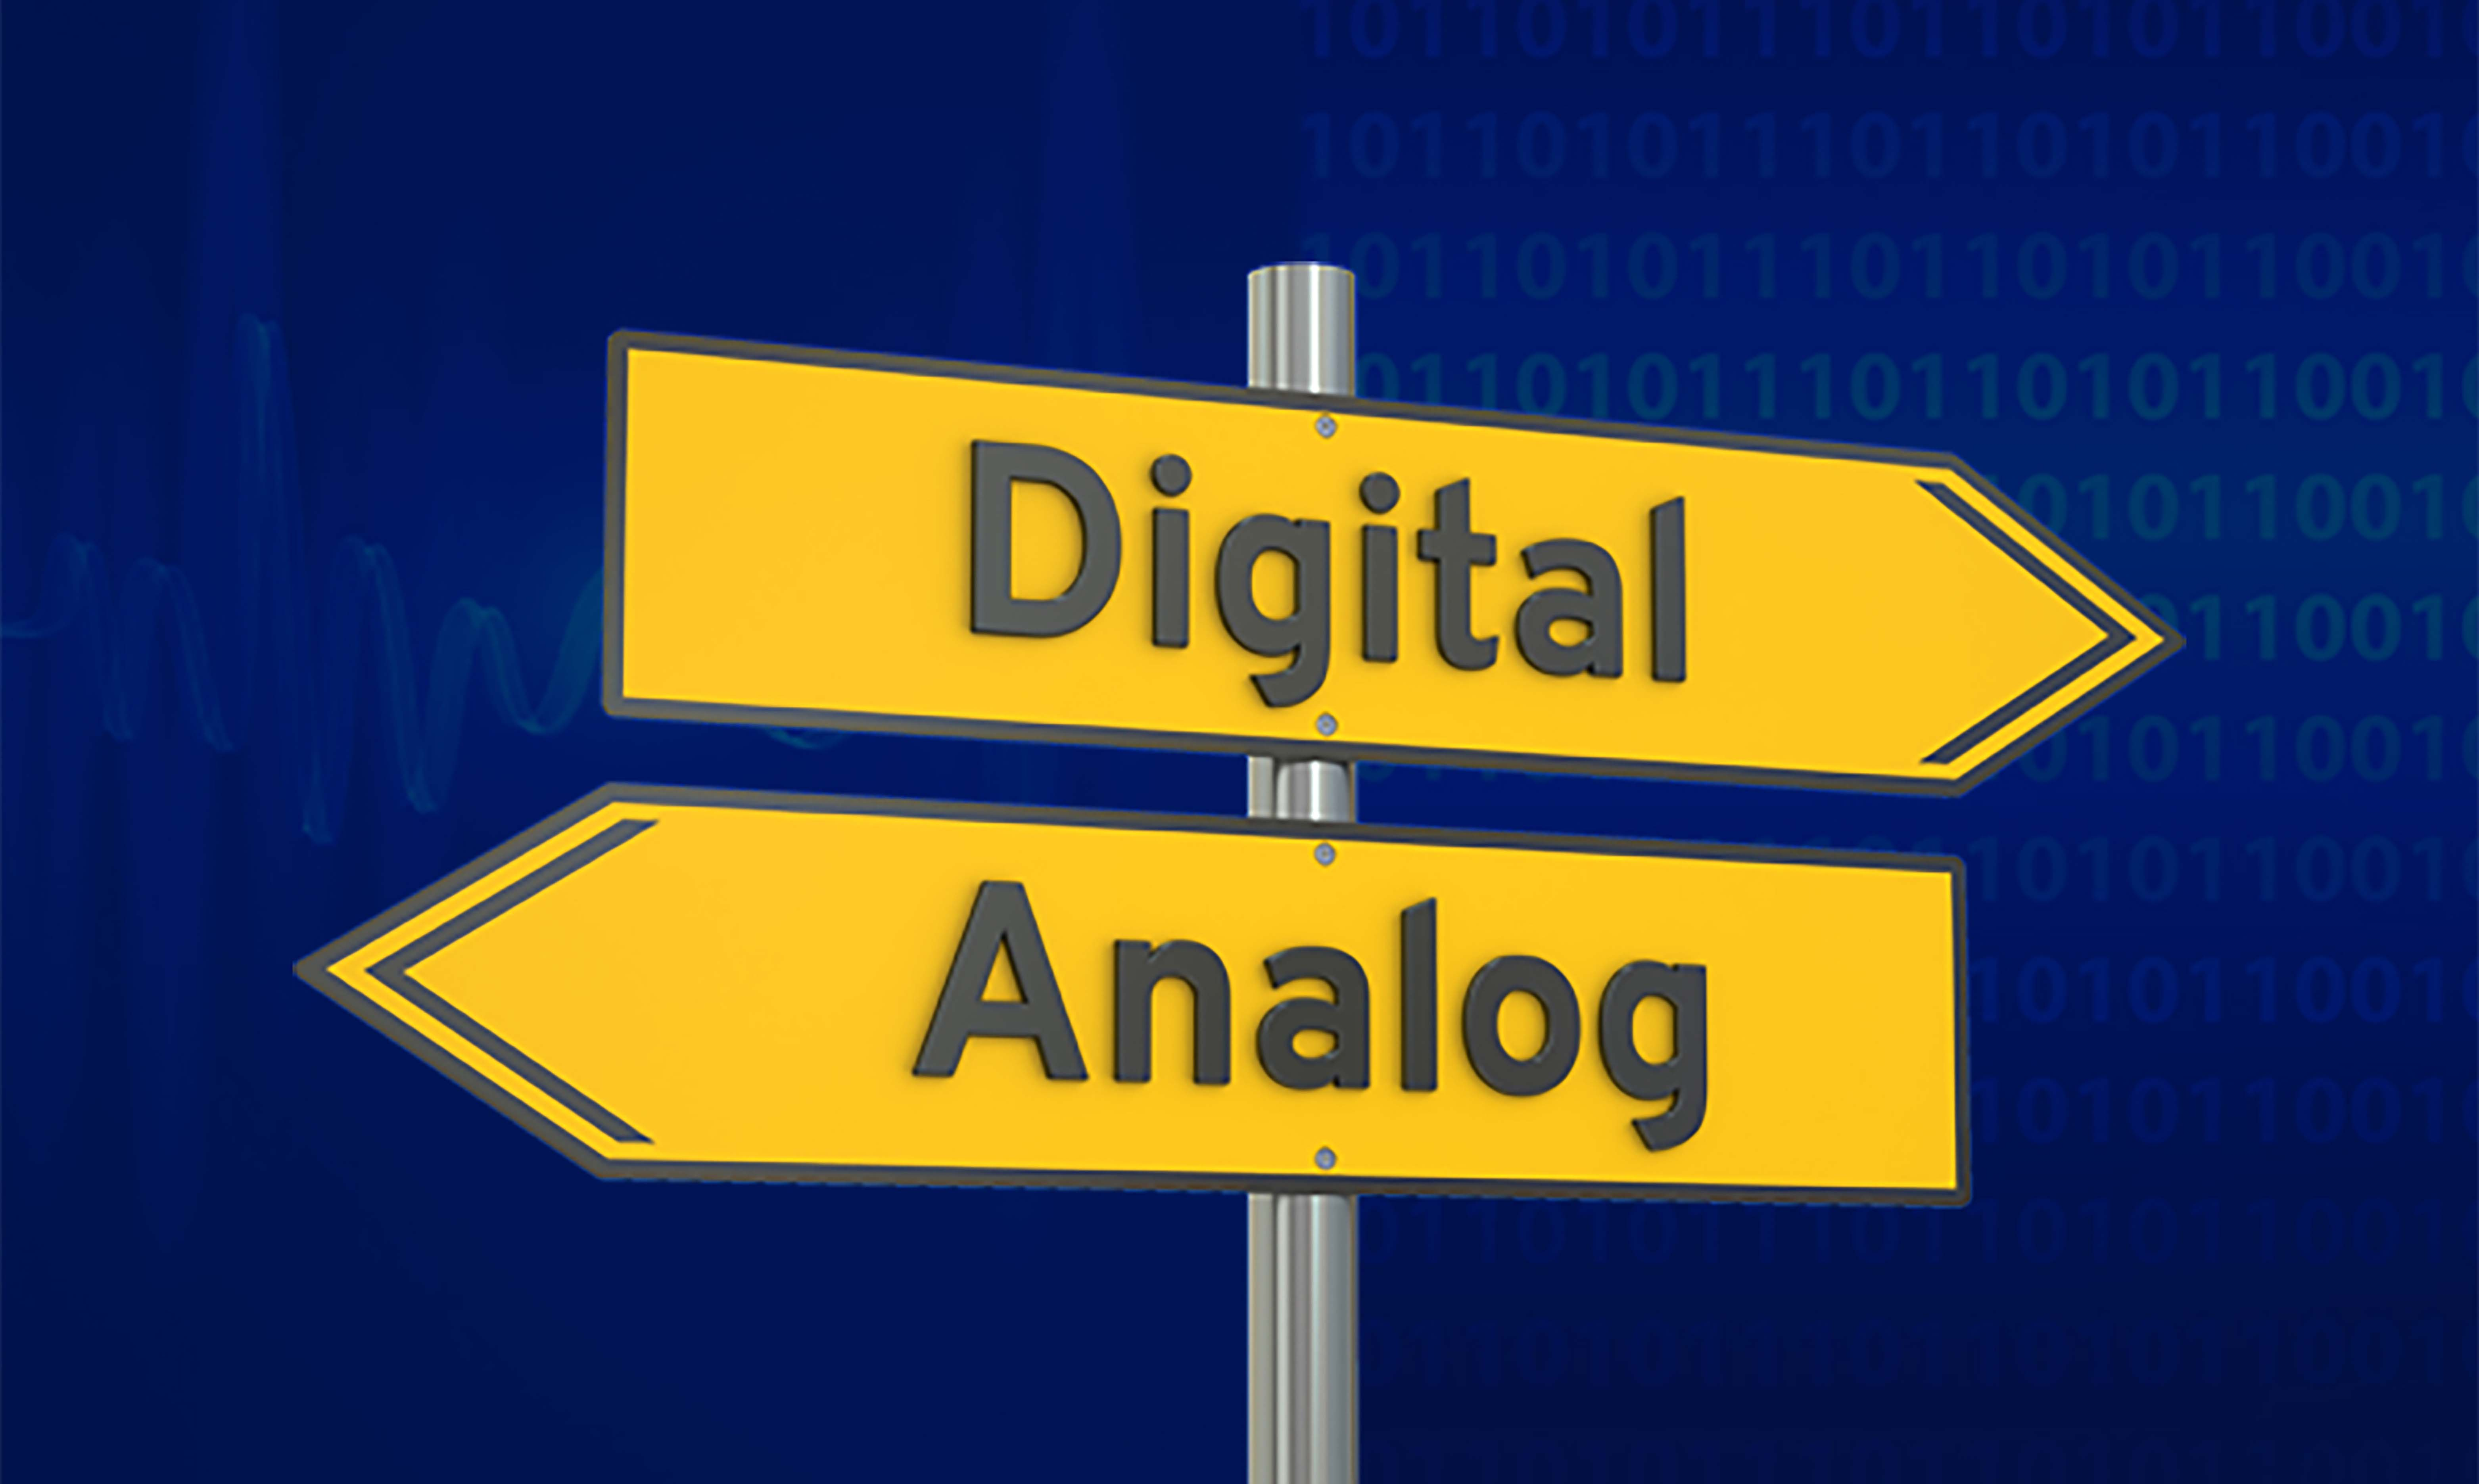 Analog digital partition 300dpi (1)